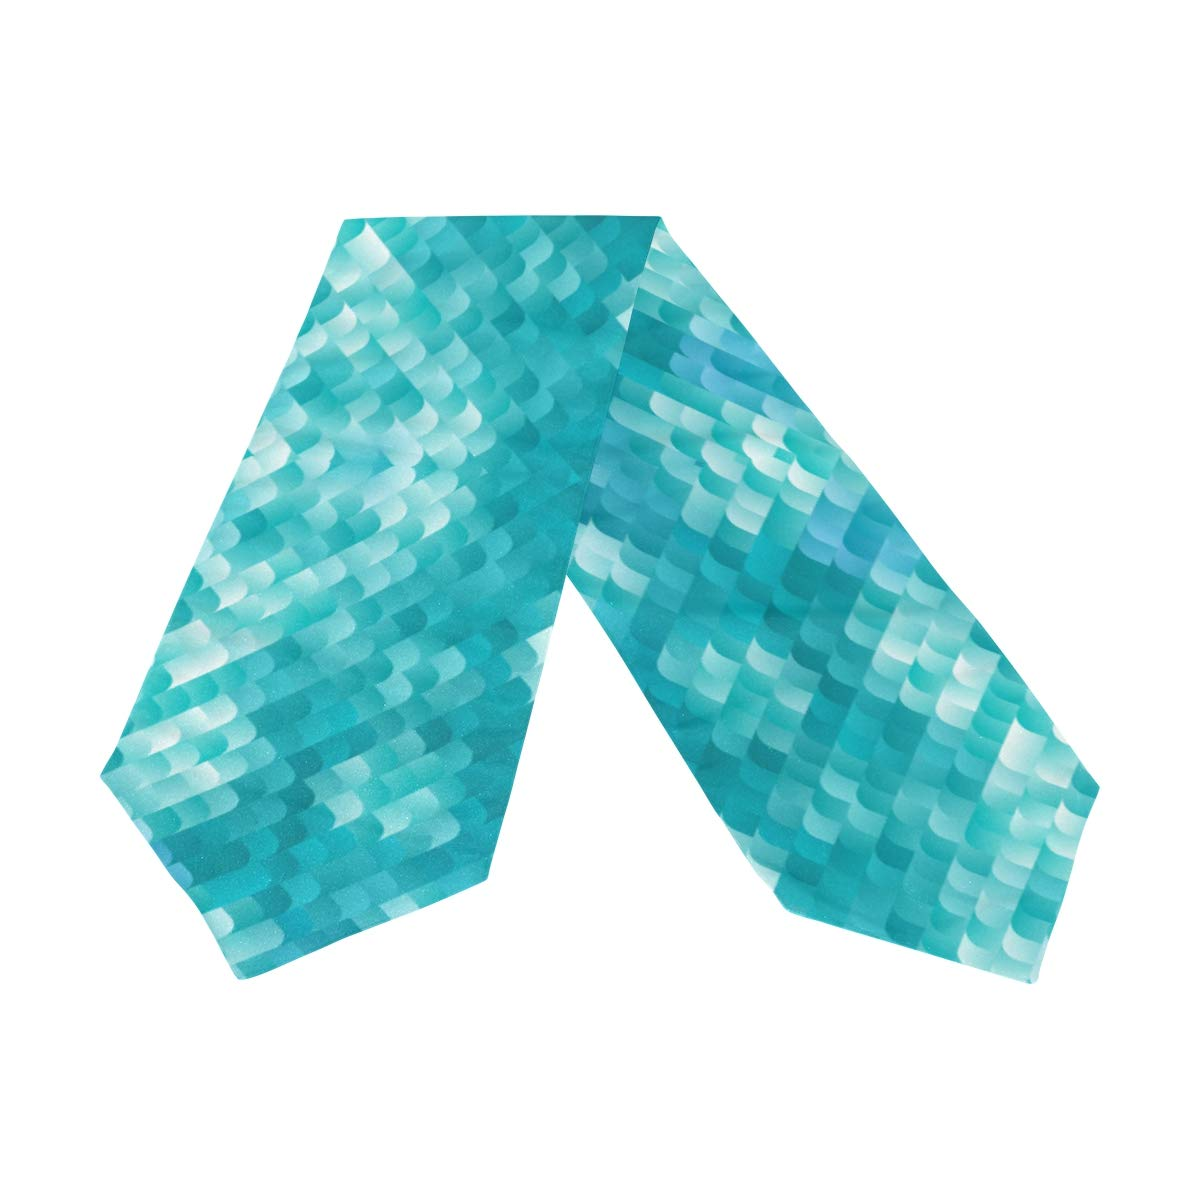 Amazon.com: WOOR Camino de mesa de doble cara azul dinámico ...